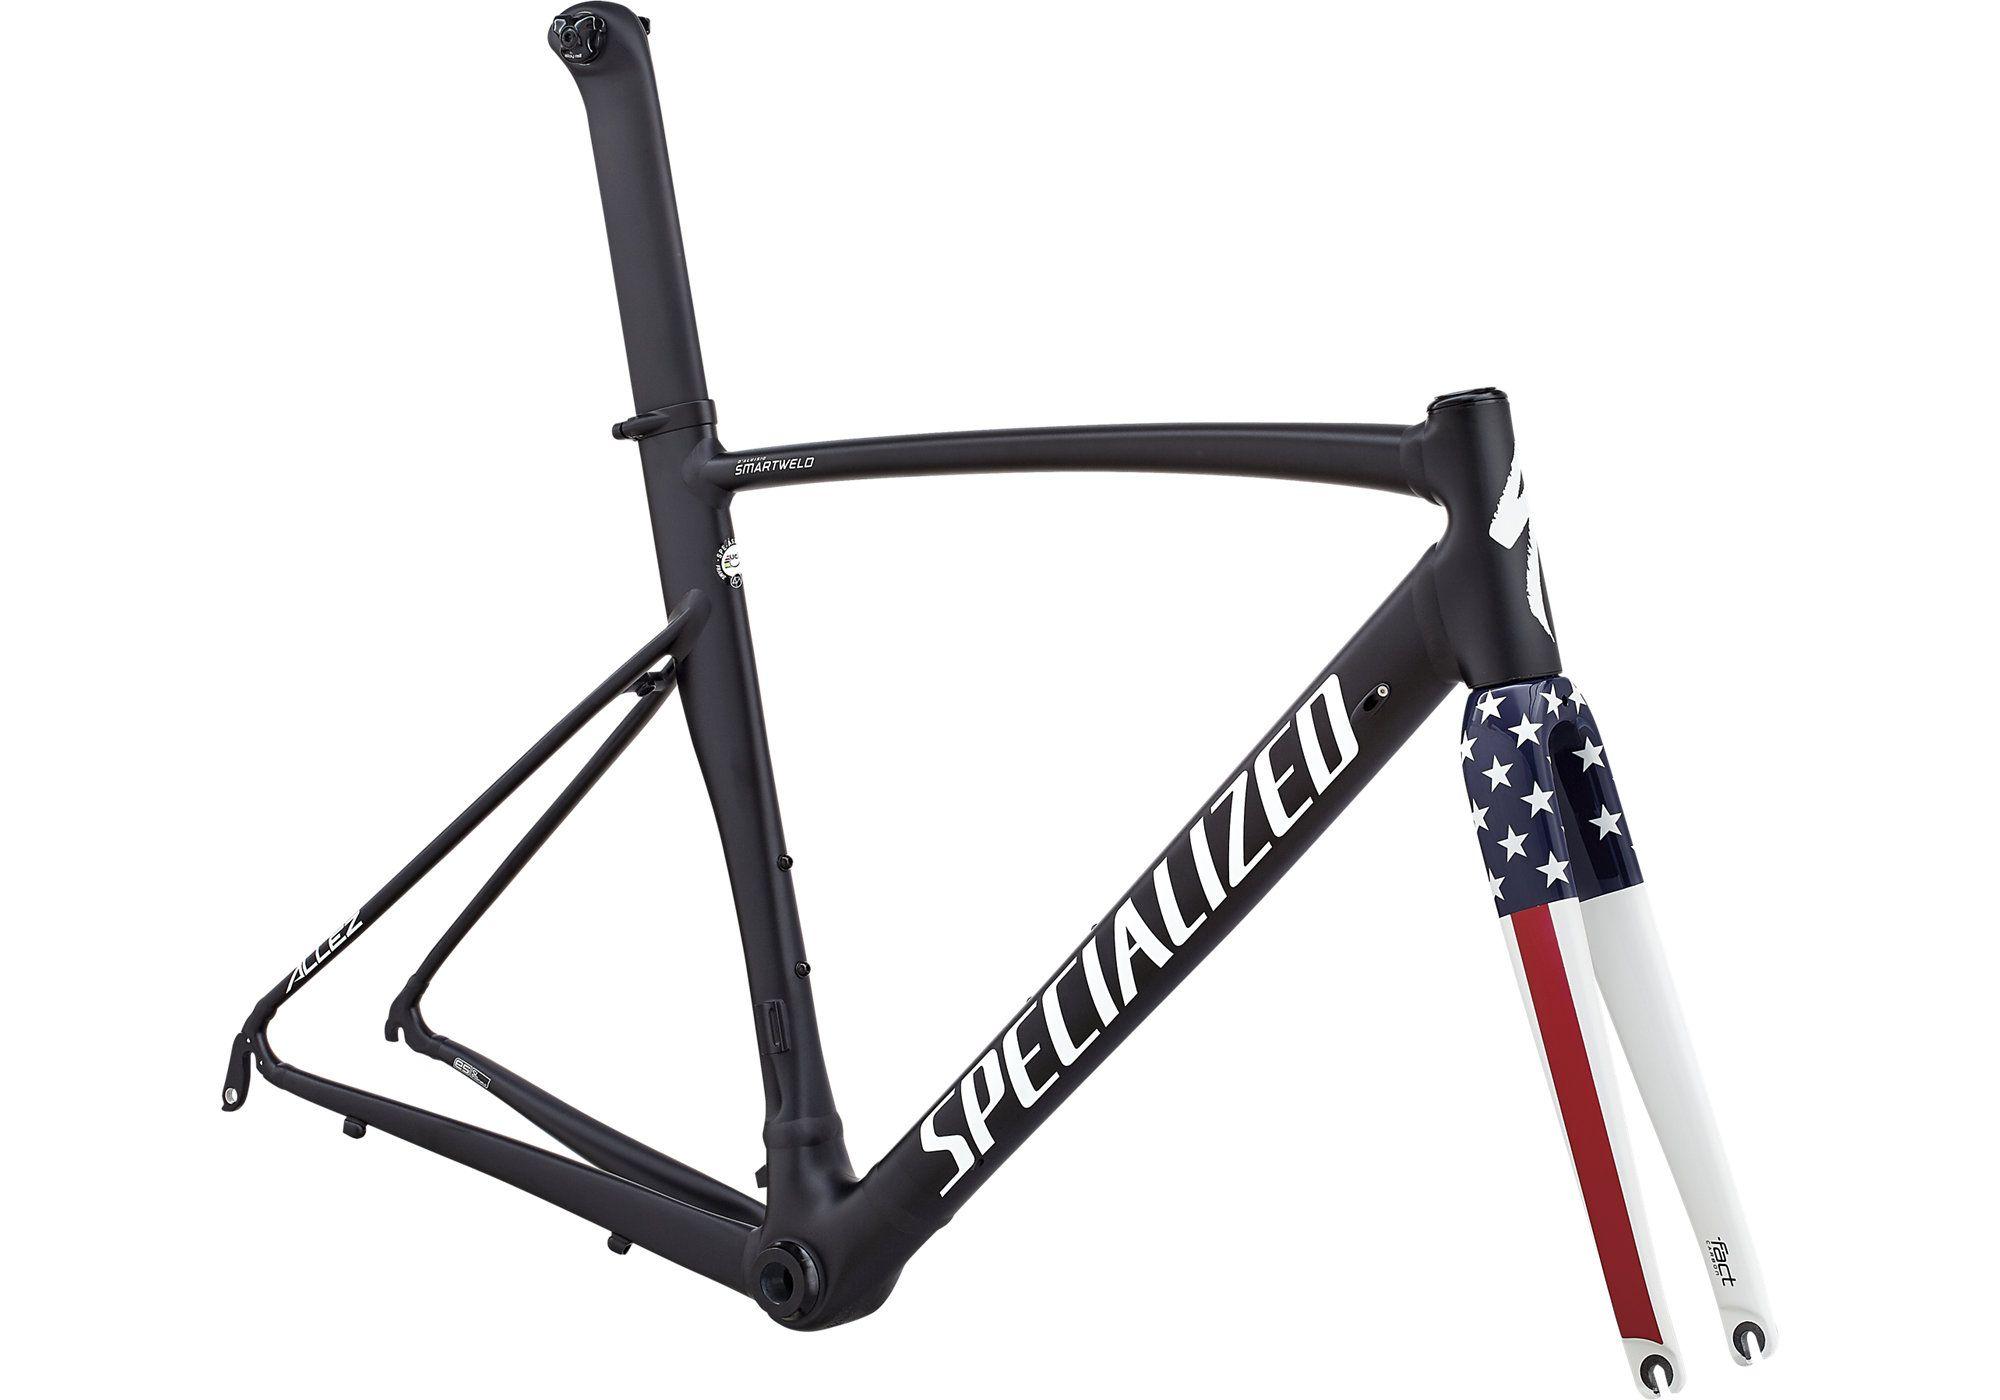 Allez Sprint Dsw Frameset Limited Edition I Aluminum Bike Specialized Bikes Sprinting